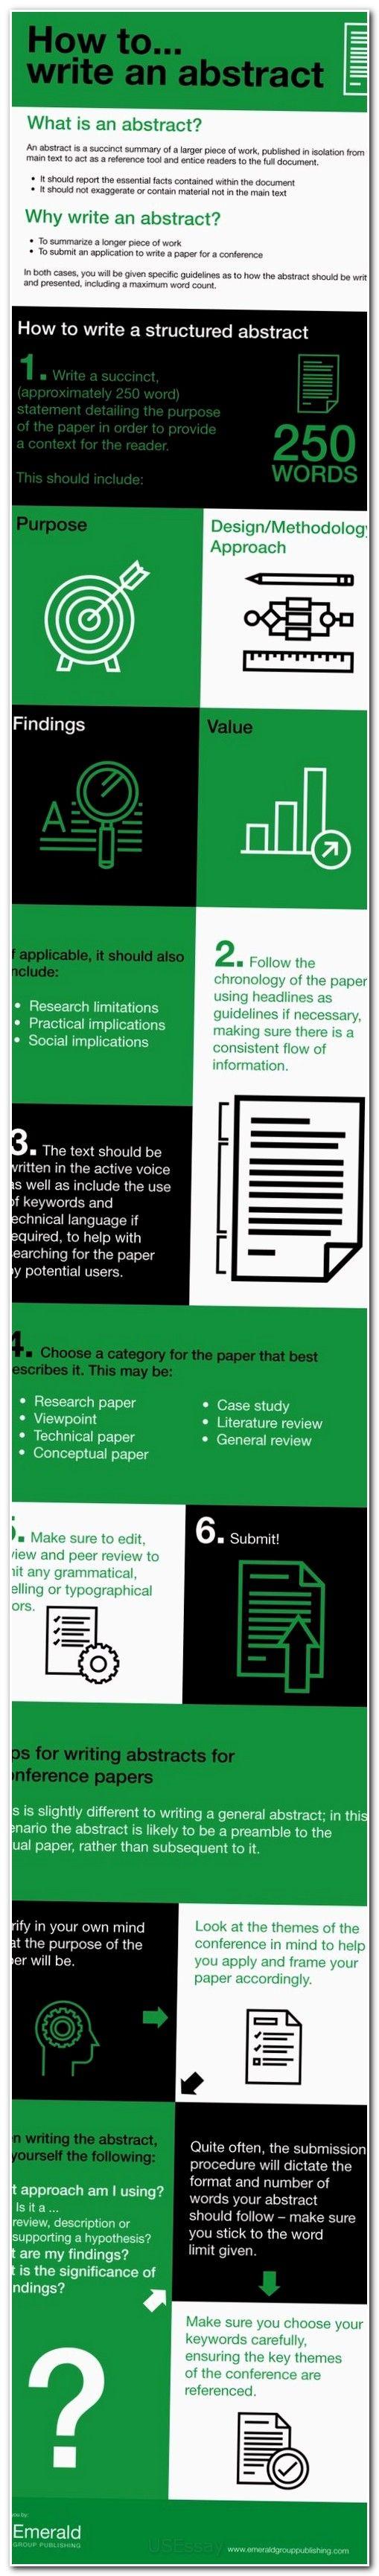 essay essayuniversity law school essay writing short